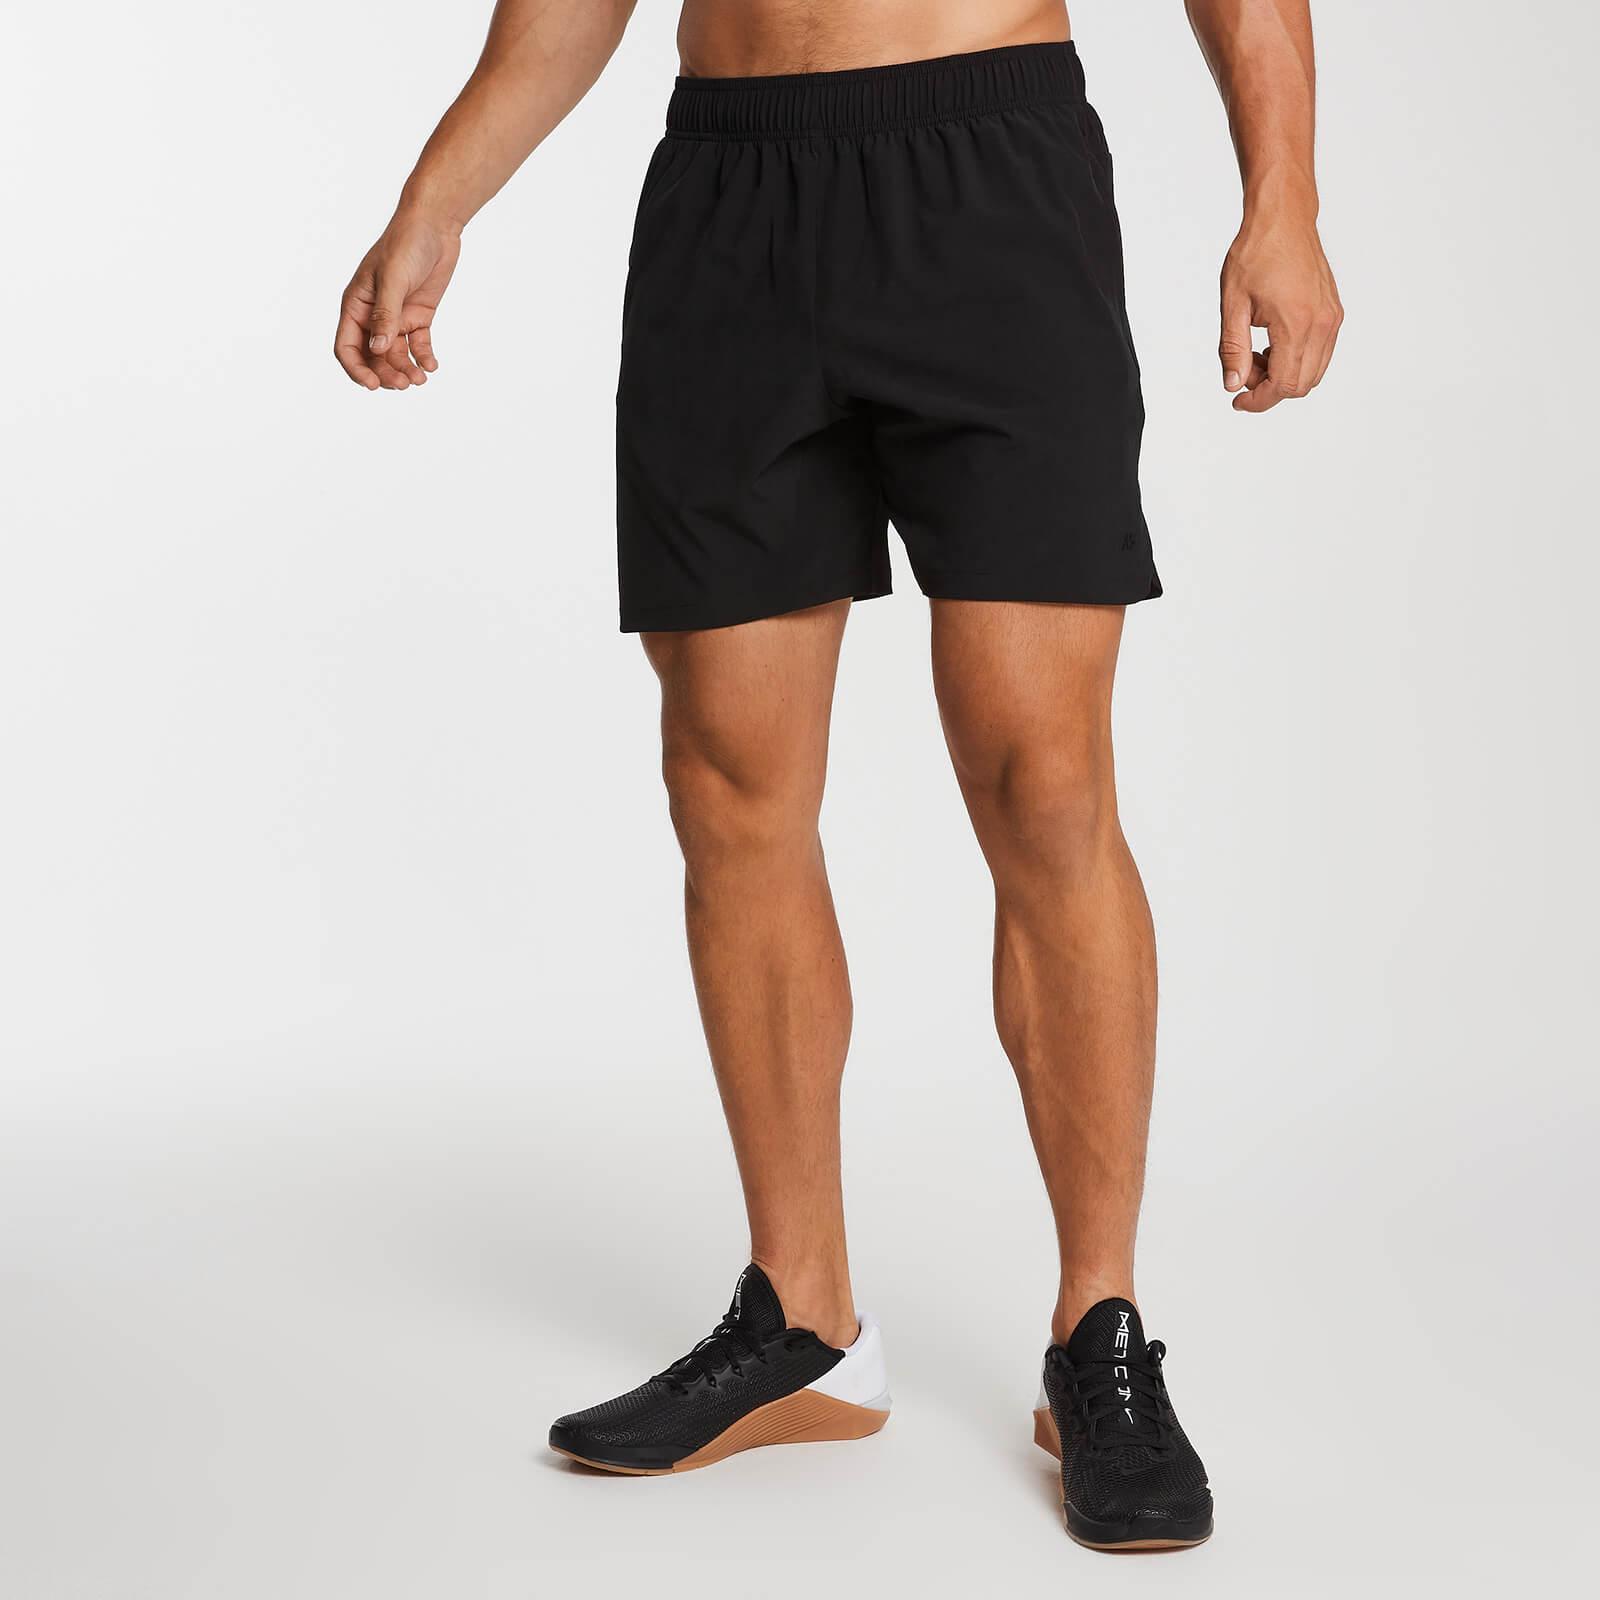 MP Essential Woven Training Shorts - Sort - Xxl